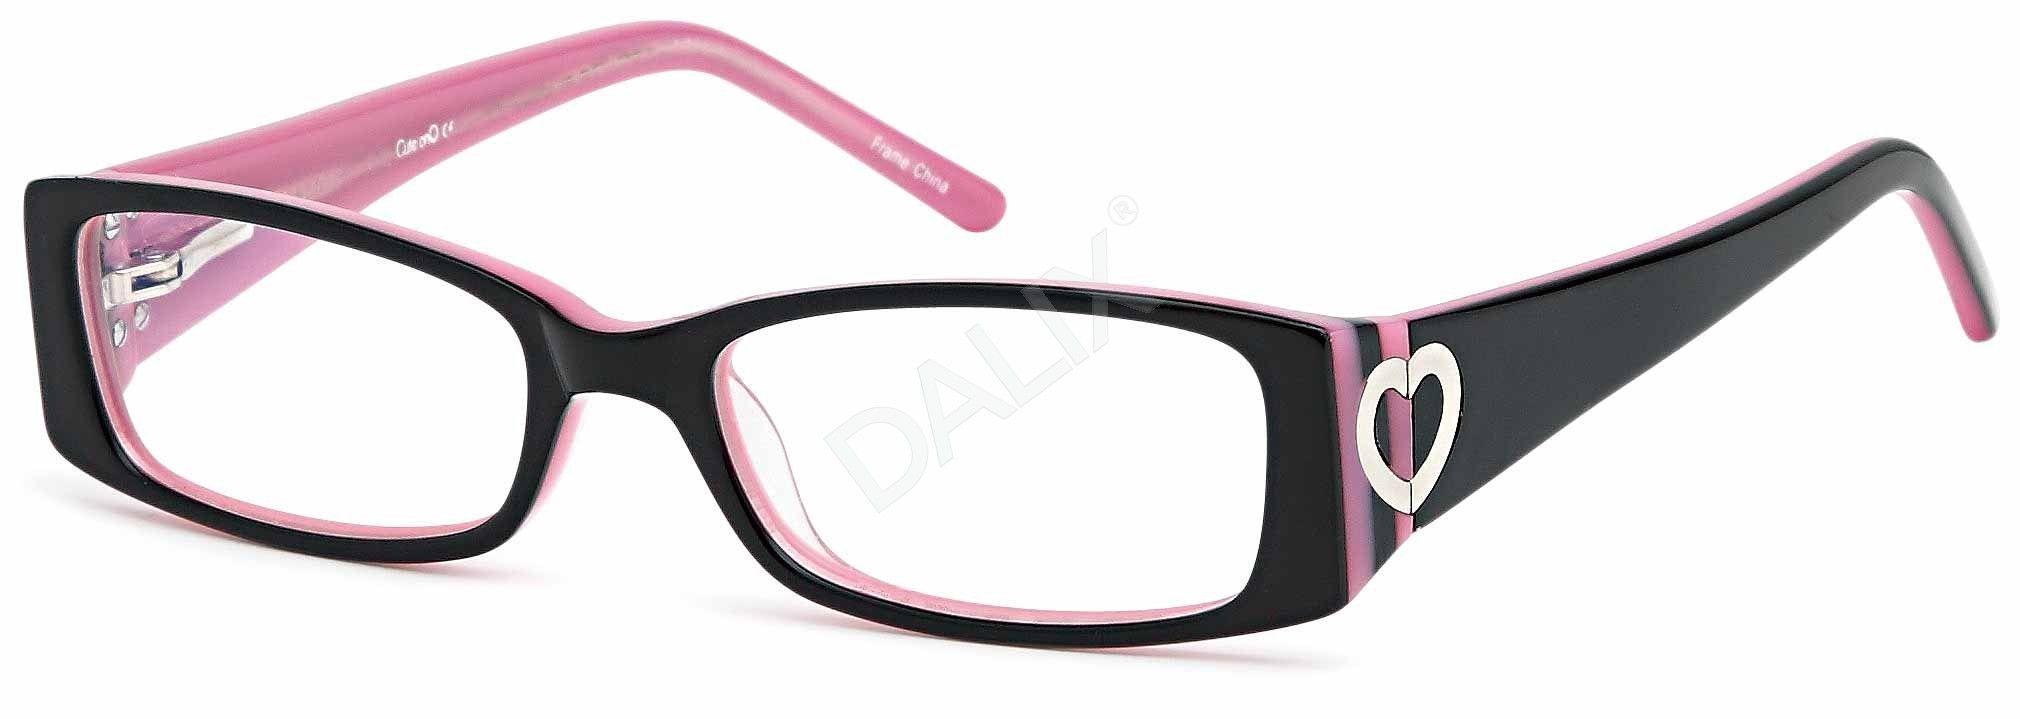 DALIX Childrens Cute Girls Hearts Glasses Frames Black Kids ...